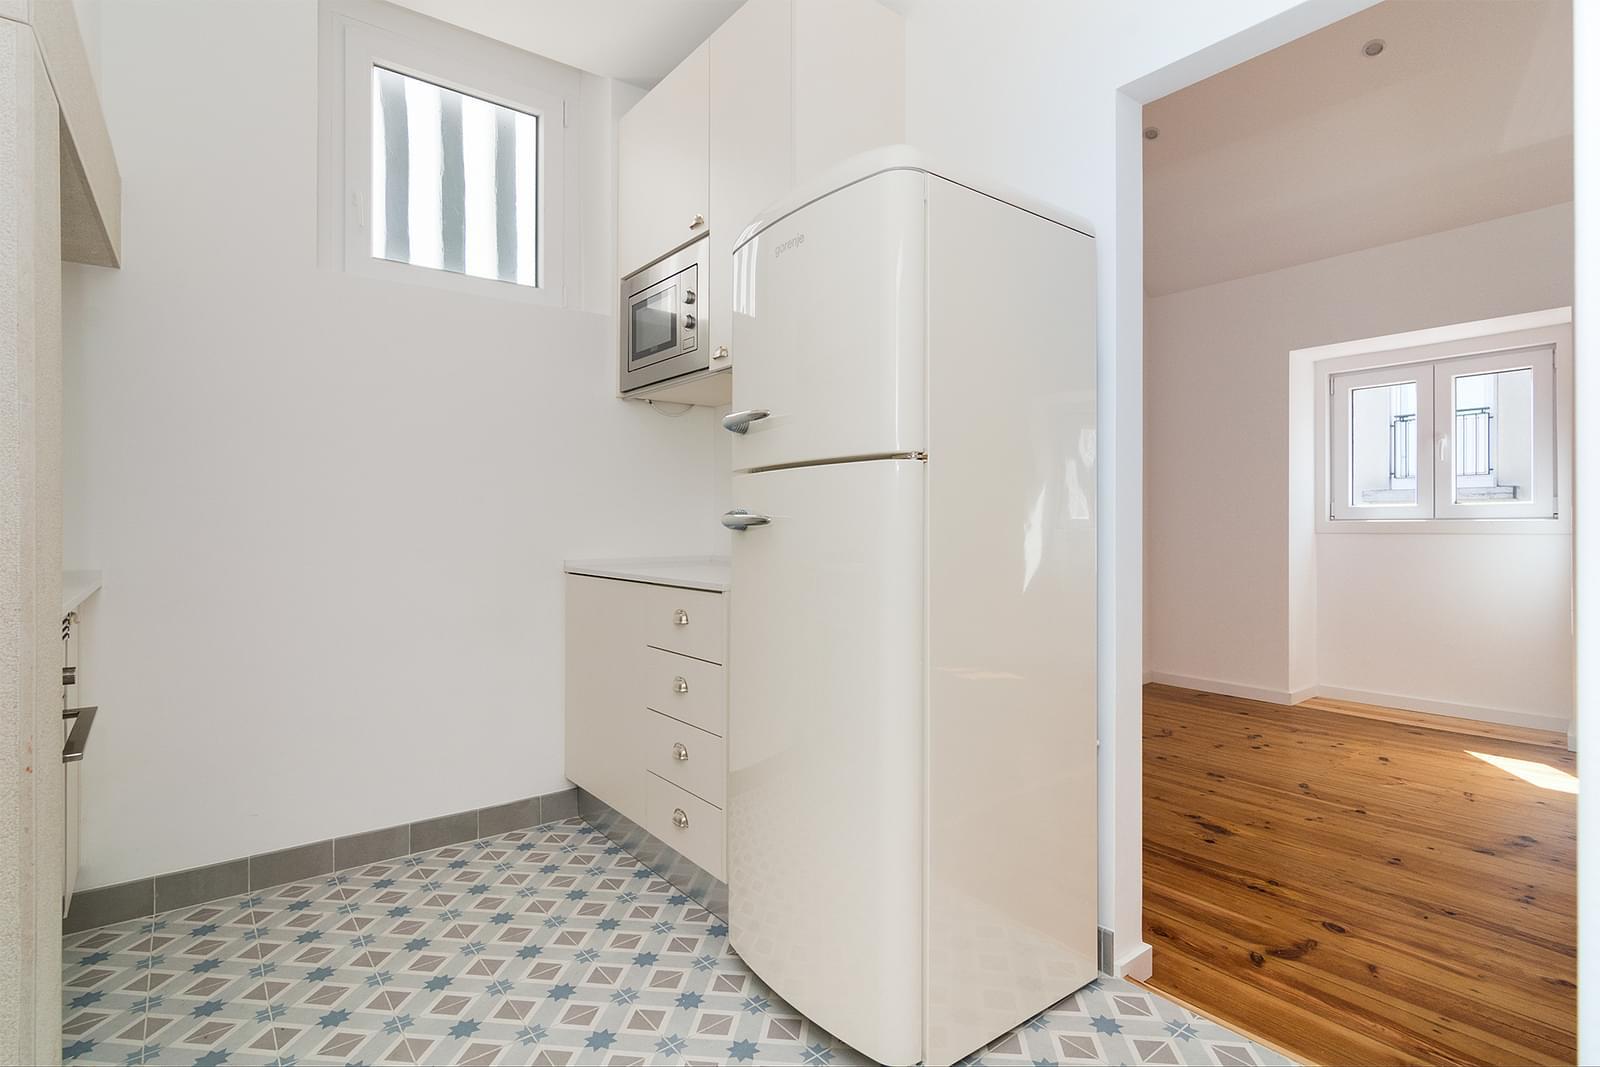 pf16908-apartamento-t2-lisboa-dc15da27-21a2-4208-aa87-052475091cfe